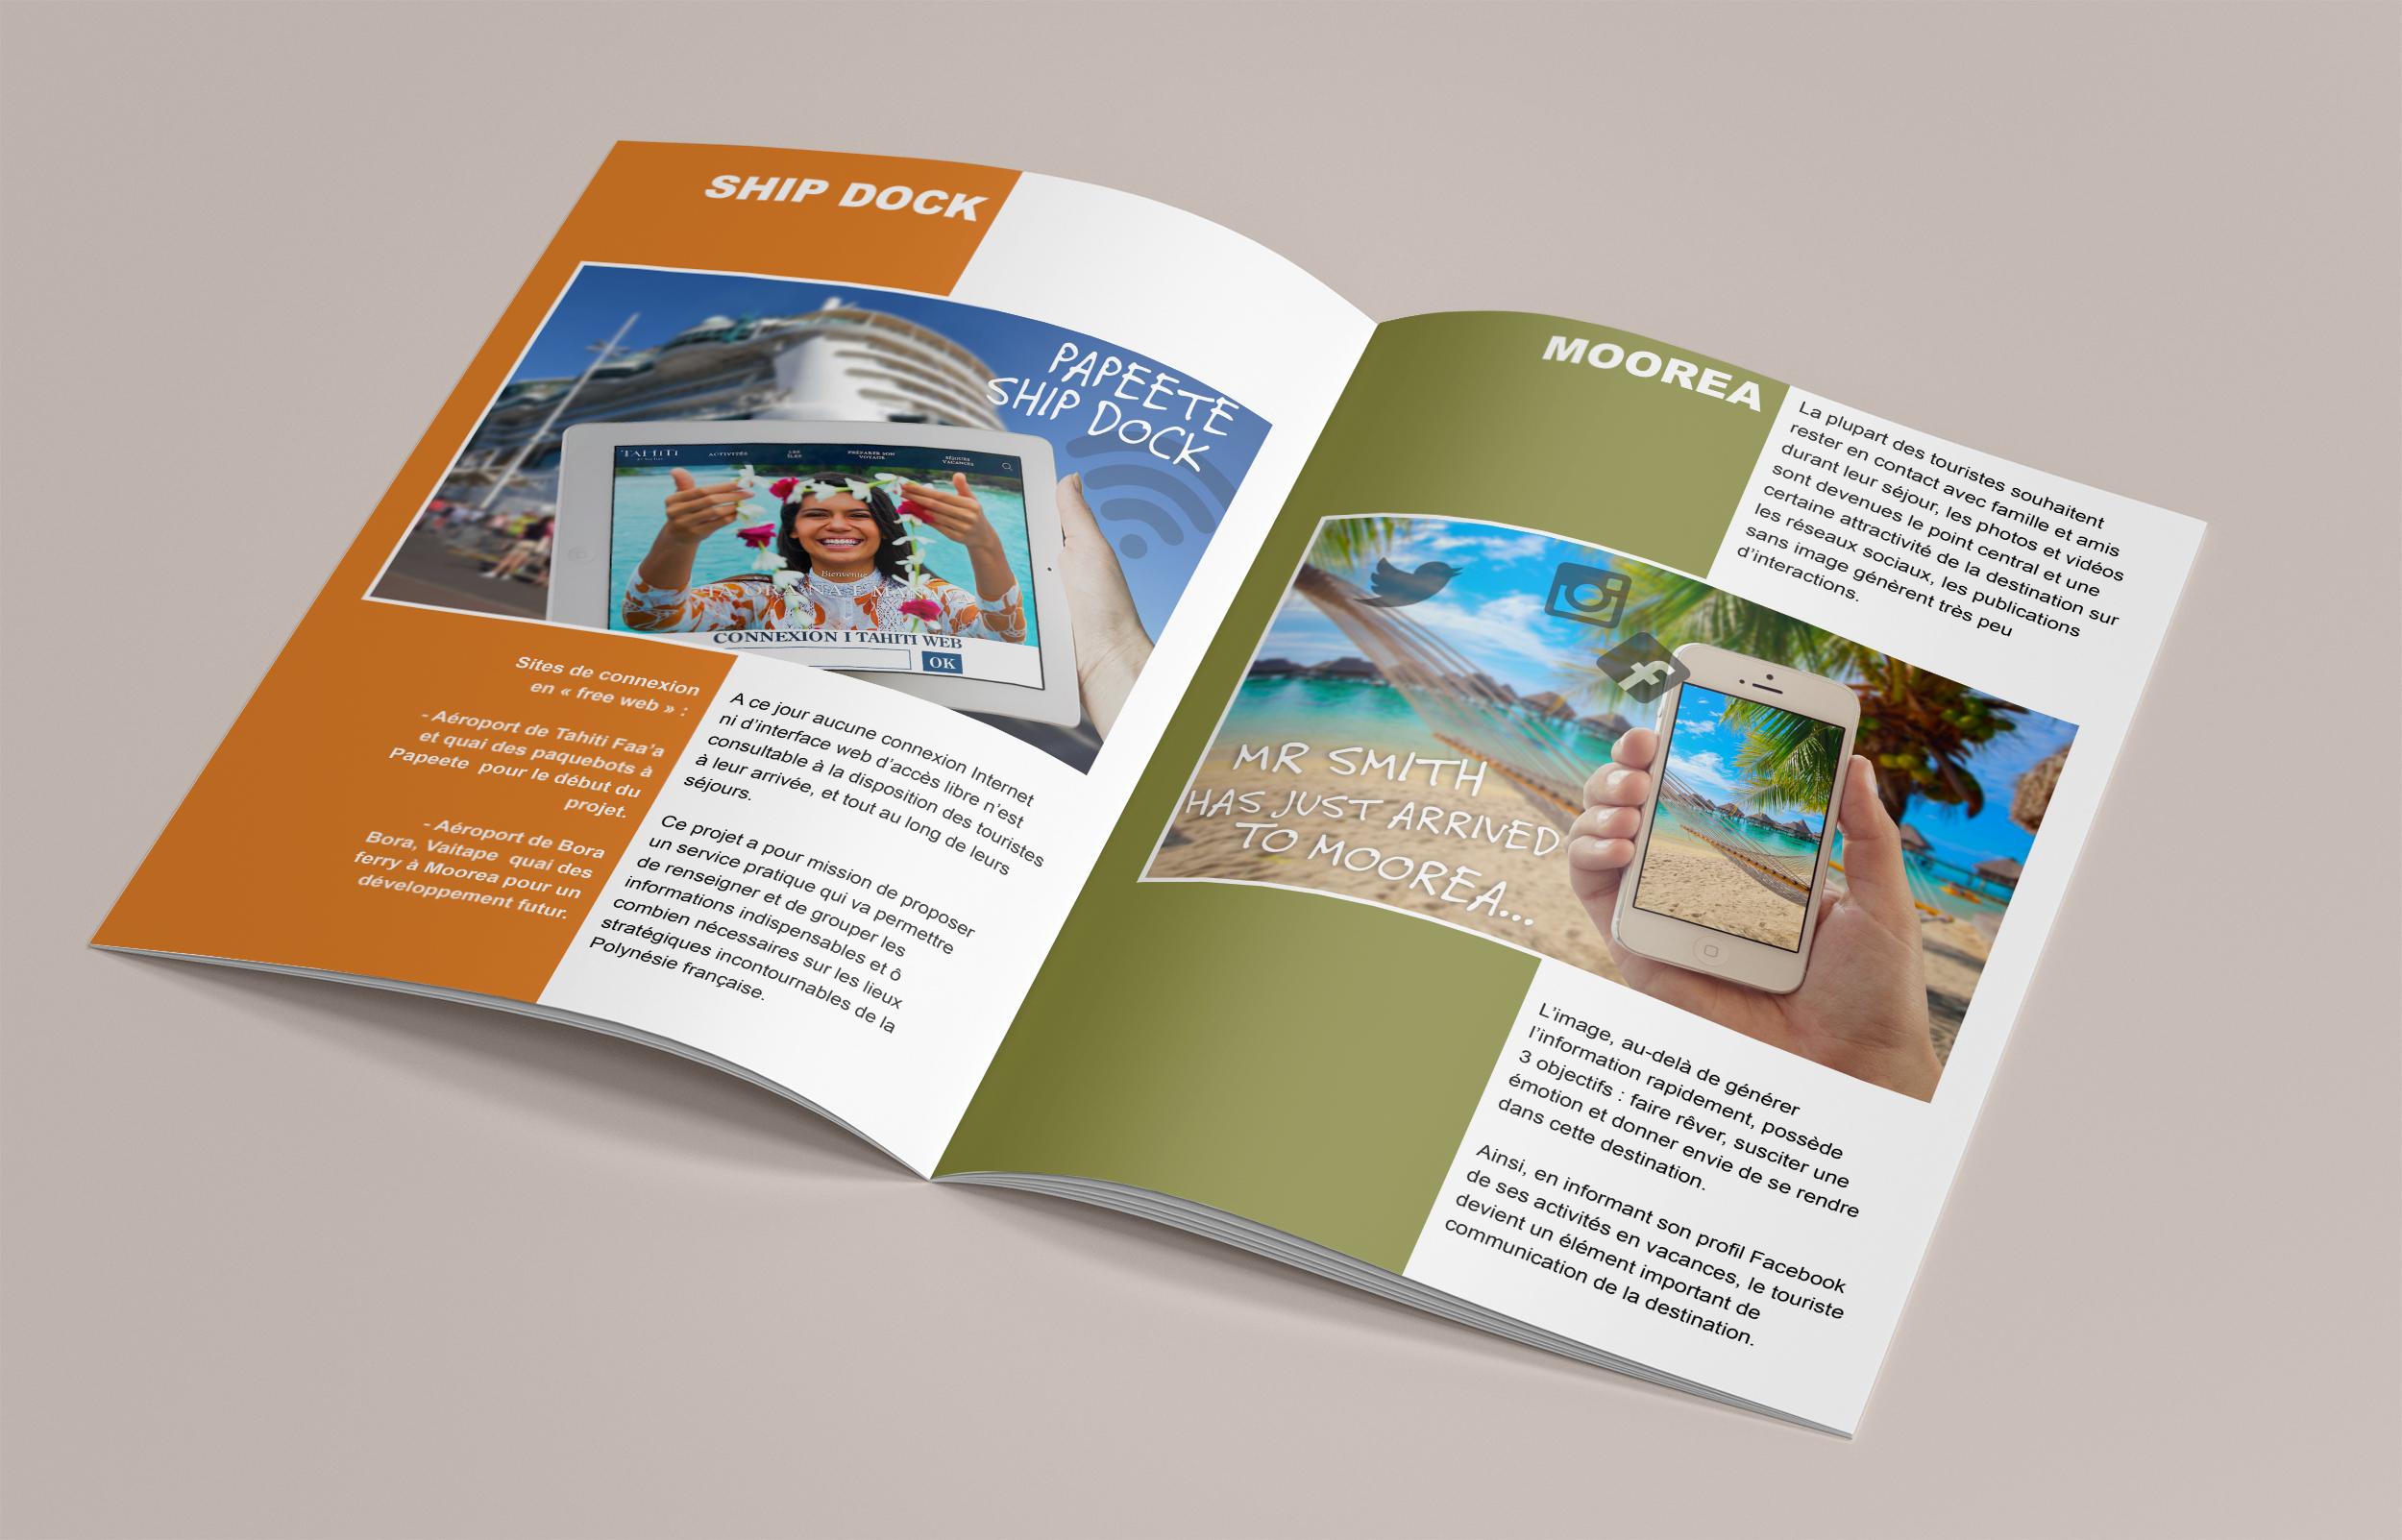 Mockup_A4_Brochure2